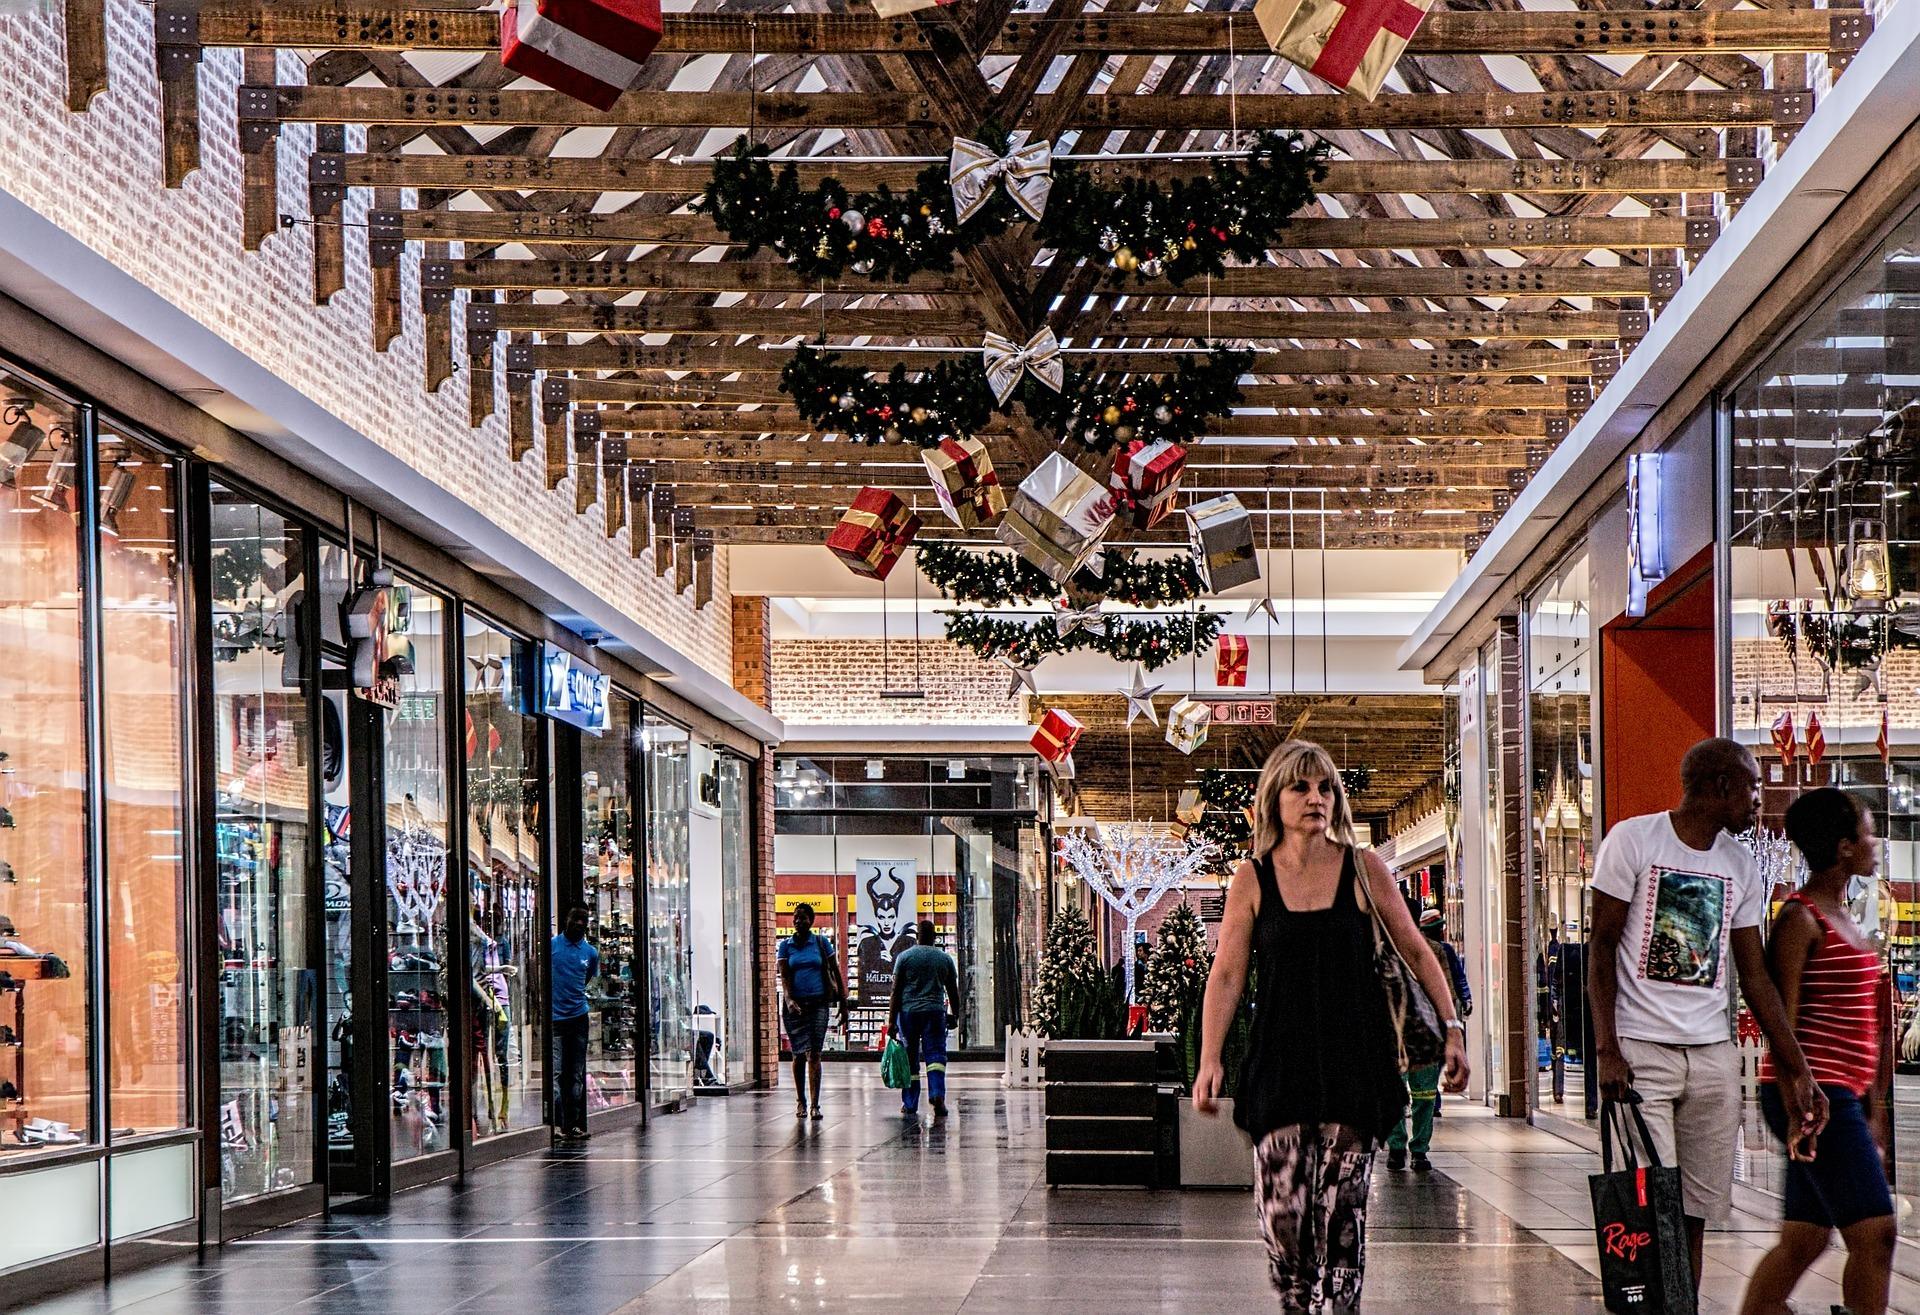 shopping-mall-522619_1920